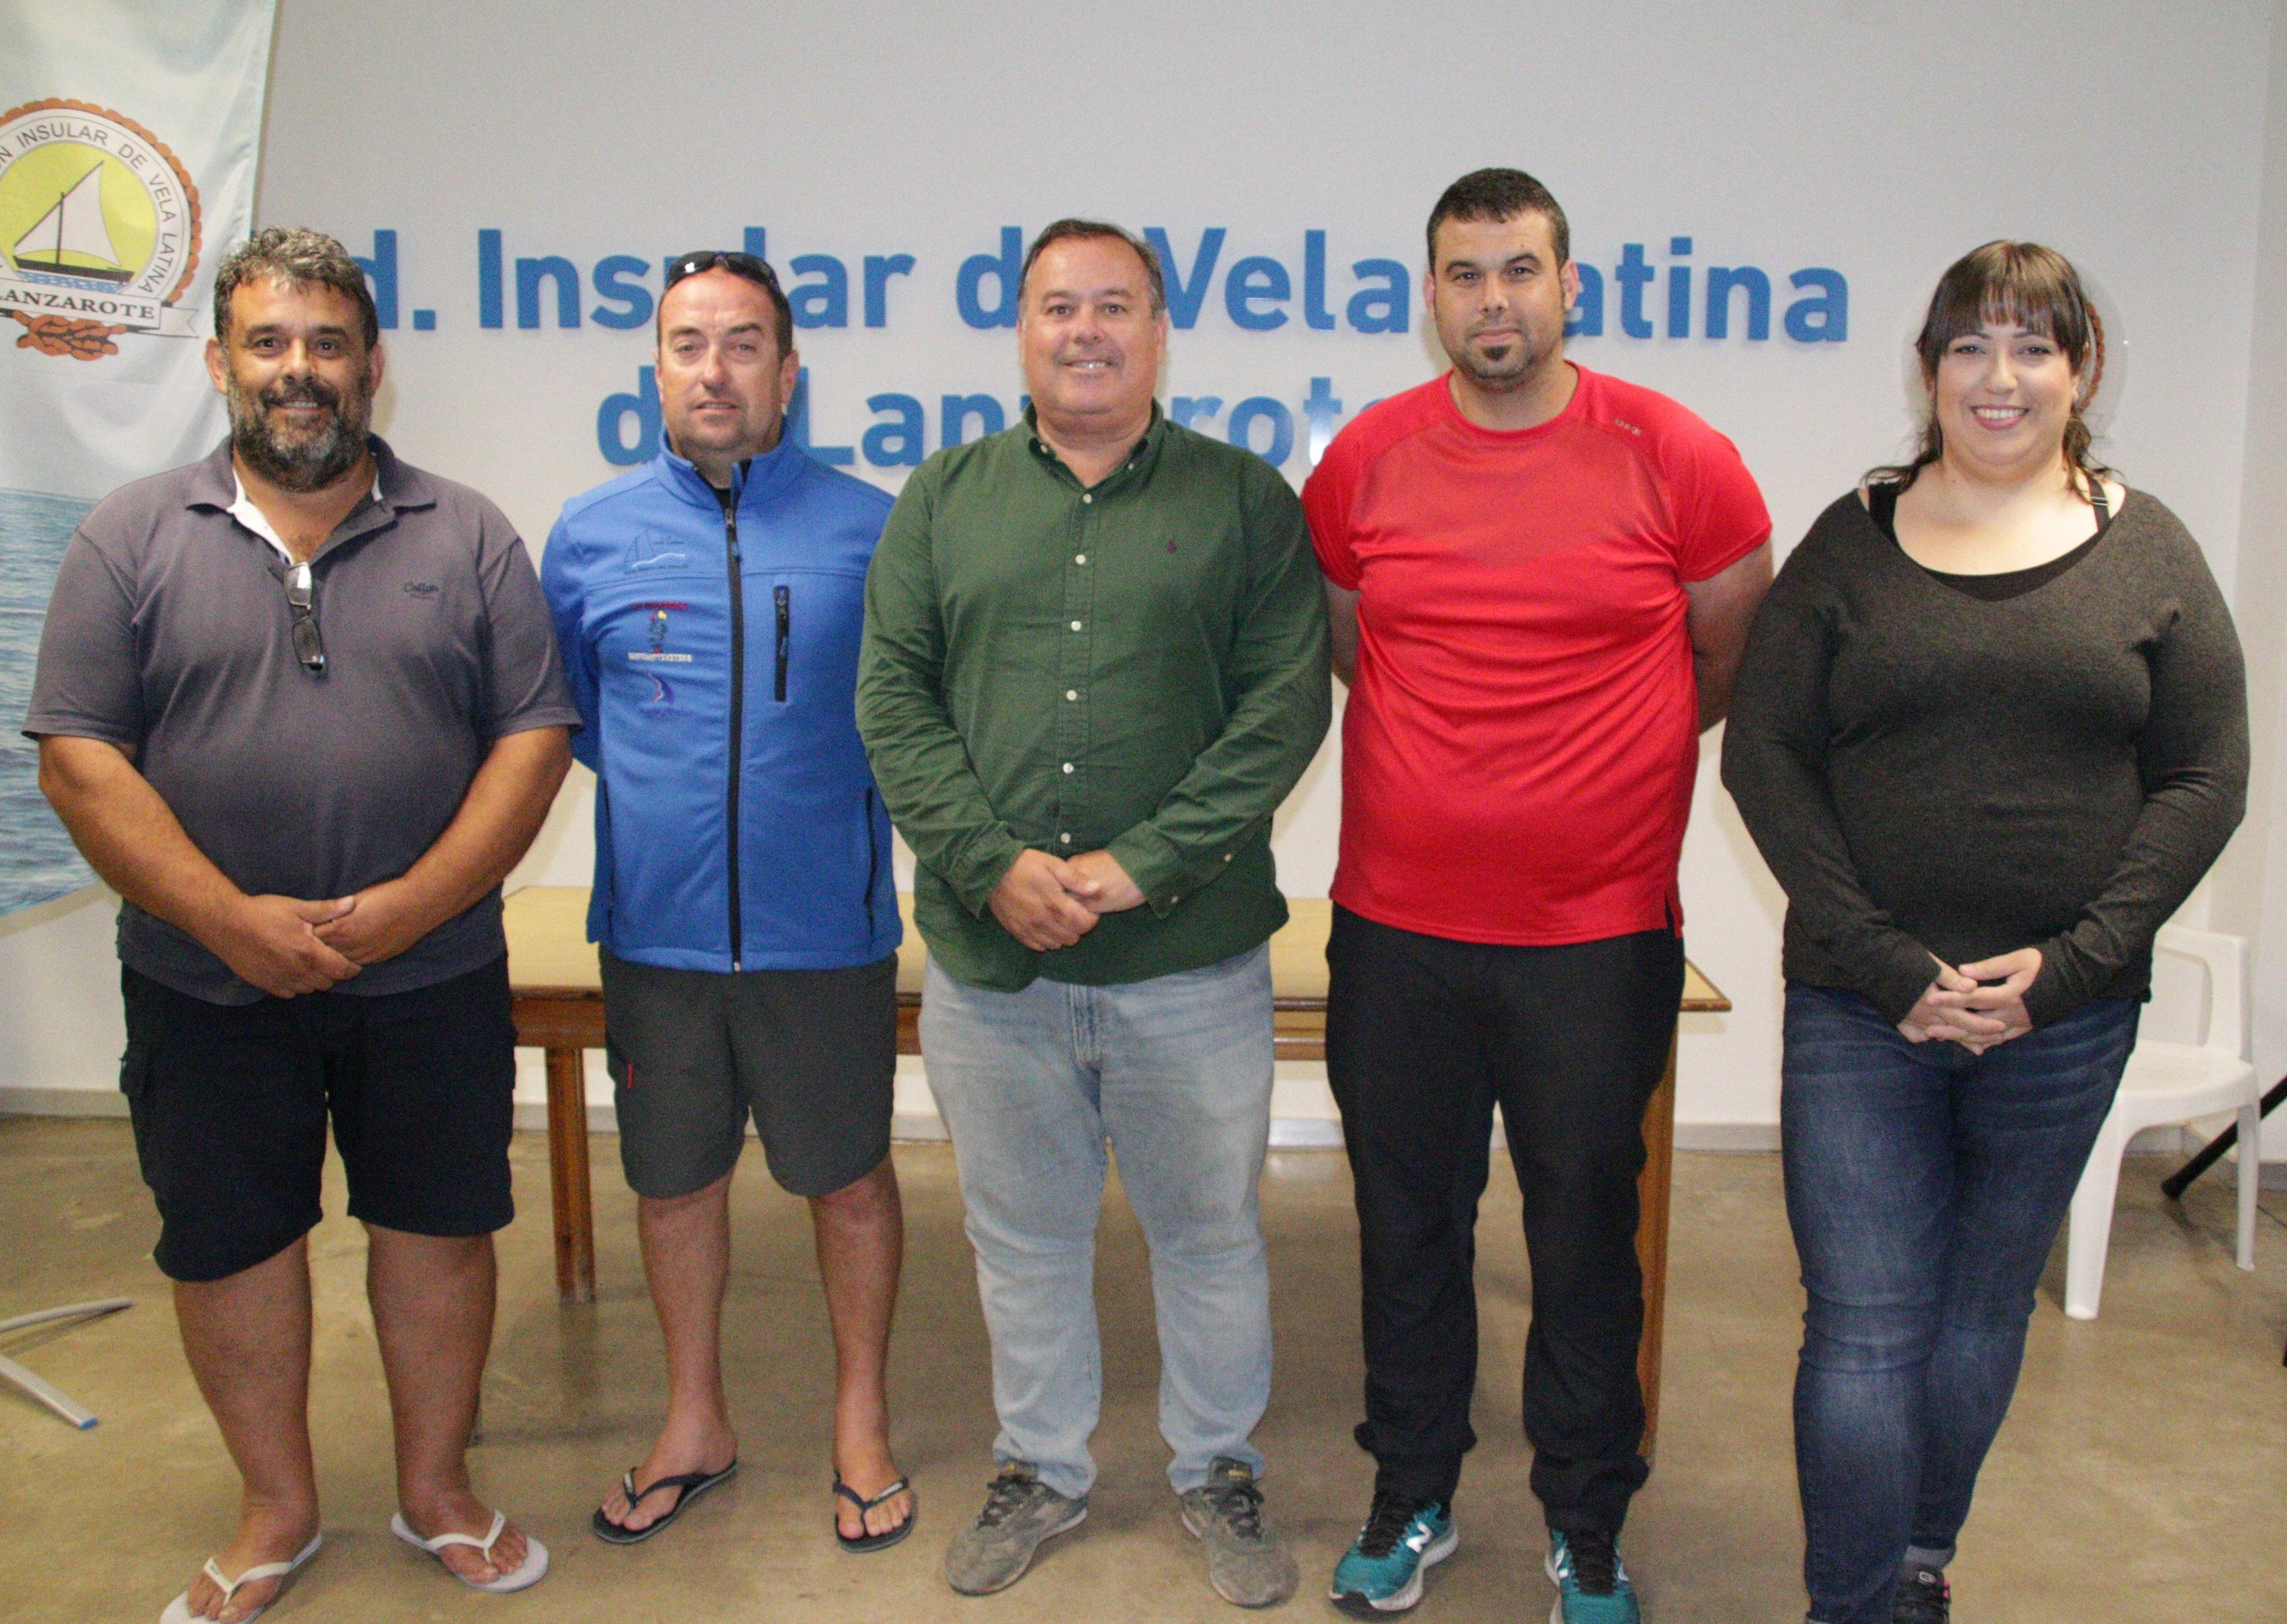 Luis Toledo toma posesión como presidente de la Federación Insular de Barquillos